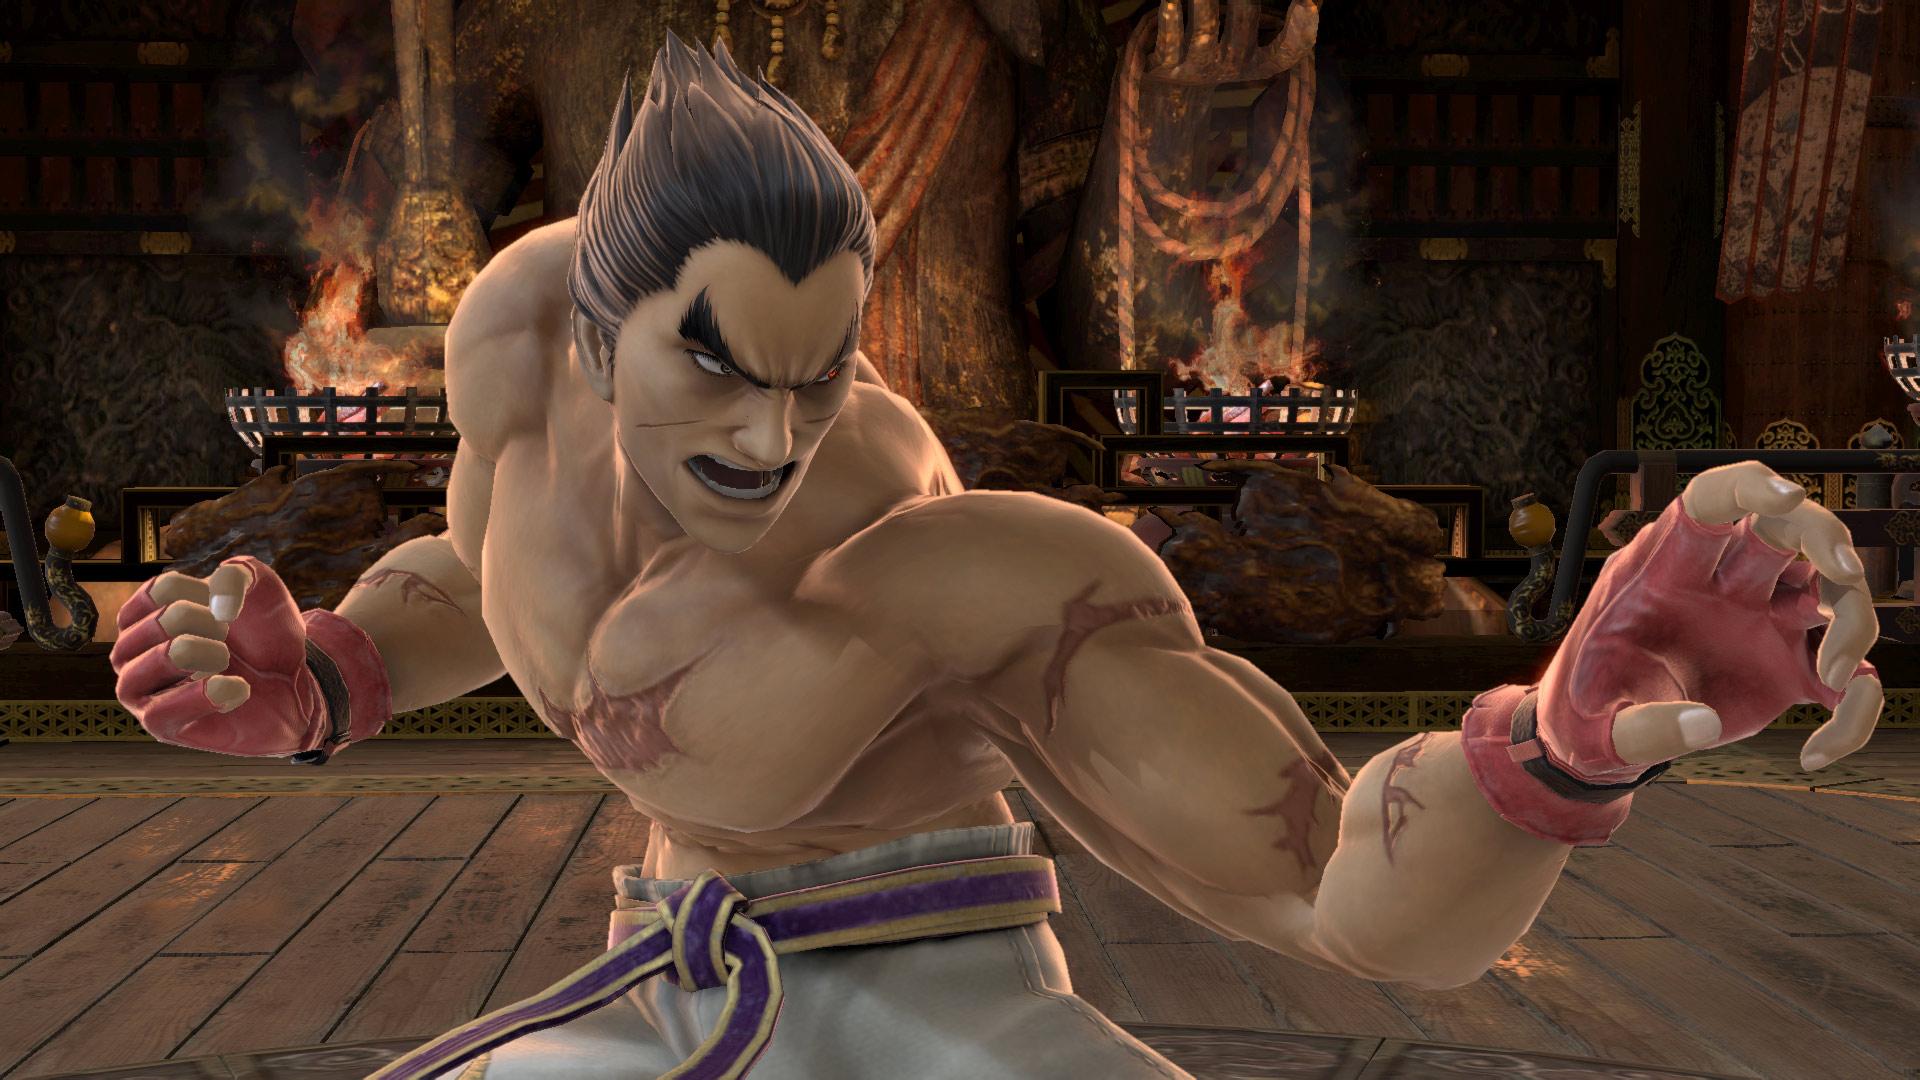 Kazuya Mishima en Super Smash Bros Ultimate